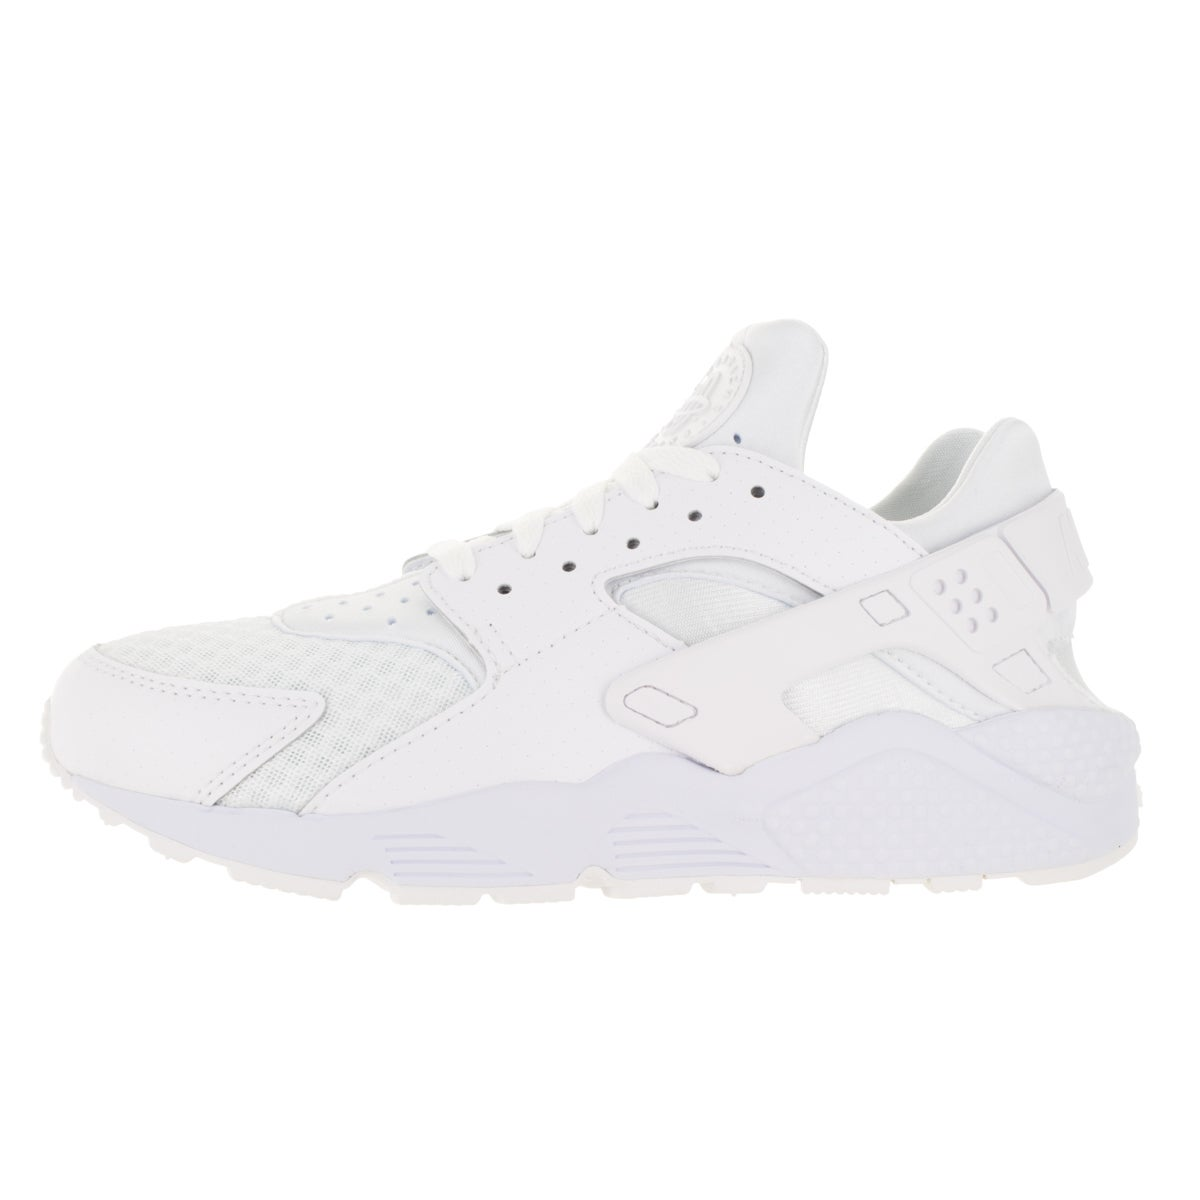 820eb1daf9b16c Shop Nike Men s Air Huarache White White Pure Platinum Running Shoe - Free  Shipping Today - Overstock - 13395237